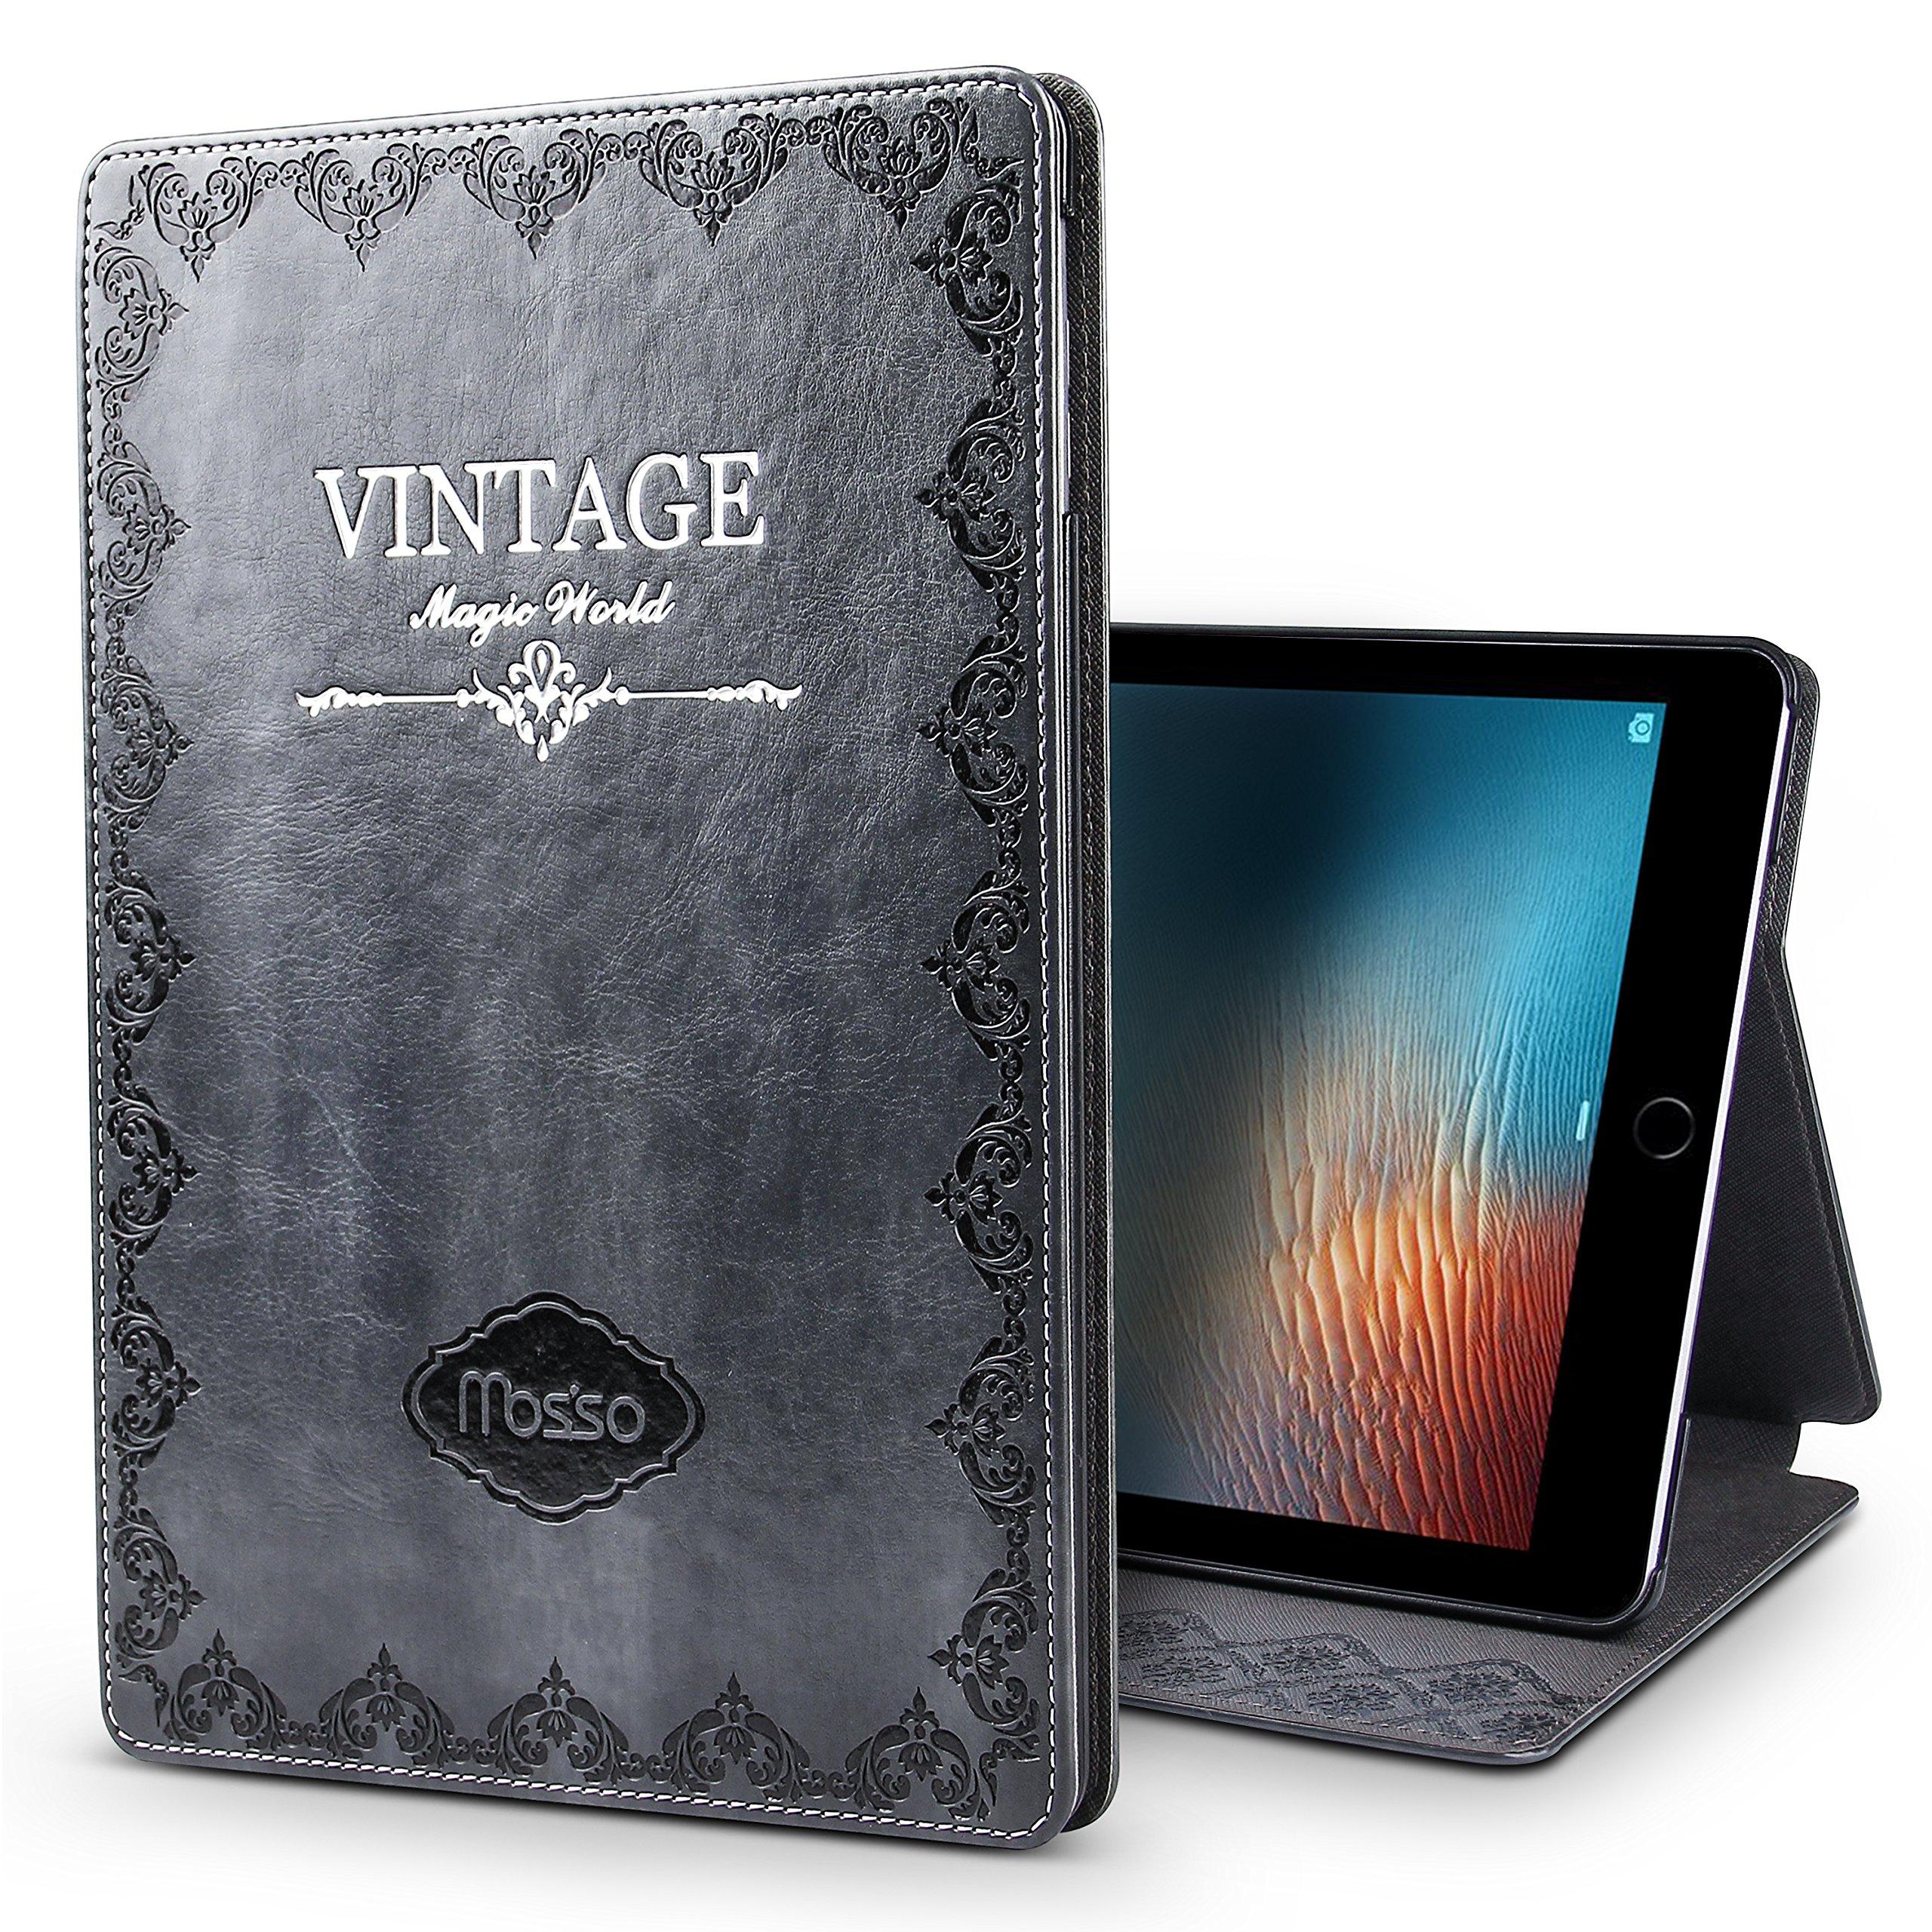 New iPad 9.7 2017 Case,JGOO ''Magic World Series'' Modern Vintage Book Style Case for New iPad 9.7 Inch(2017 Release),Silm PU Leather Smart Case w/ Auto Sleep Wake & Multi Angle Stand,Grey